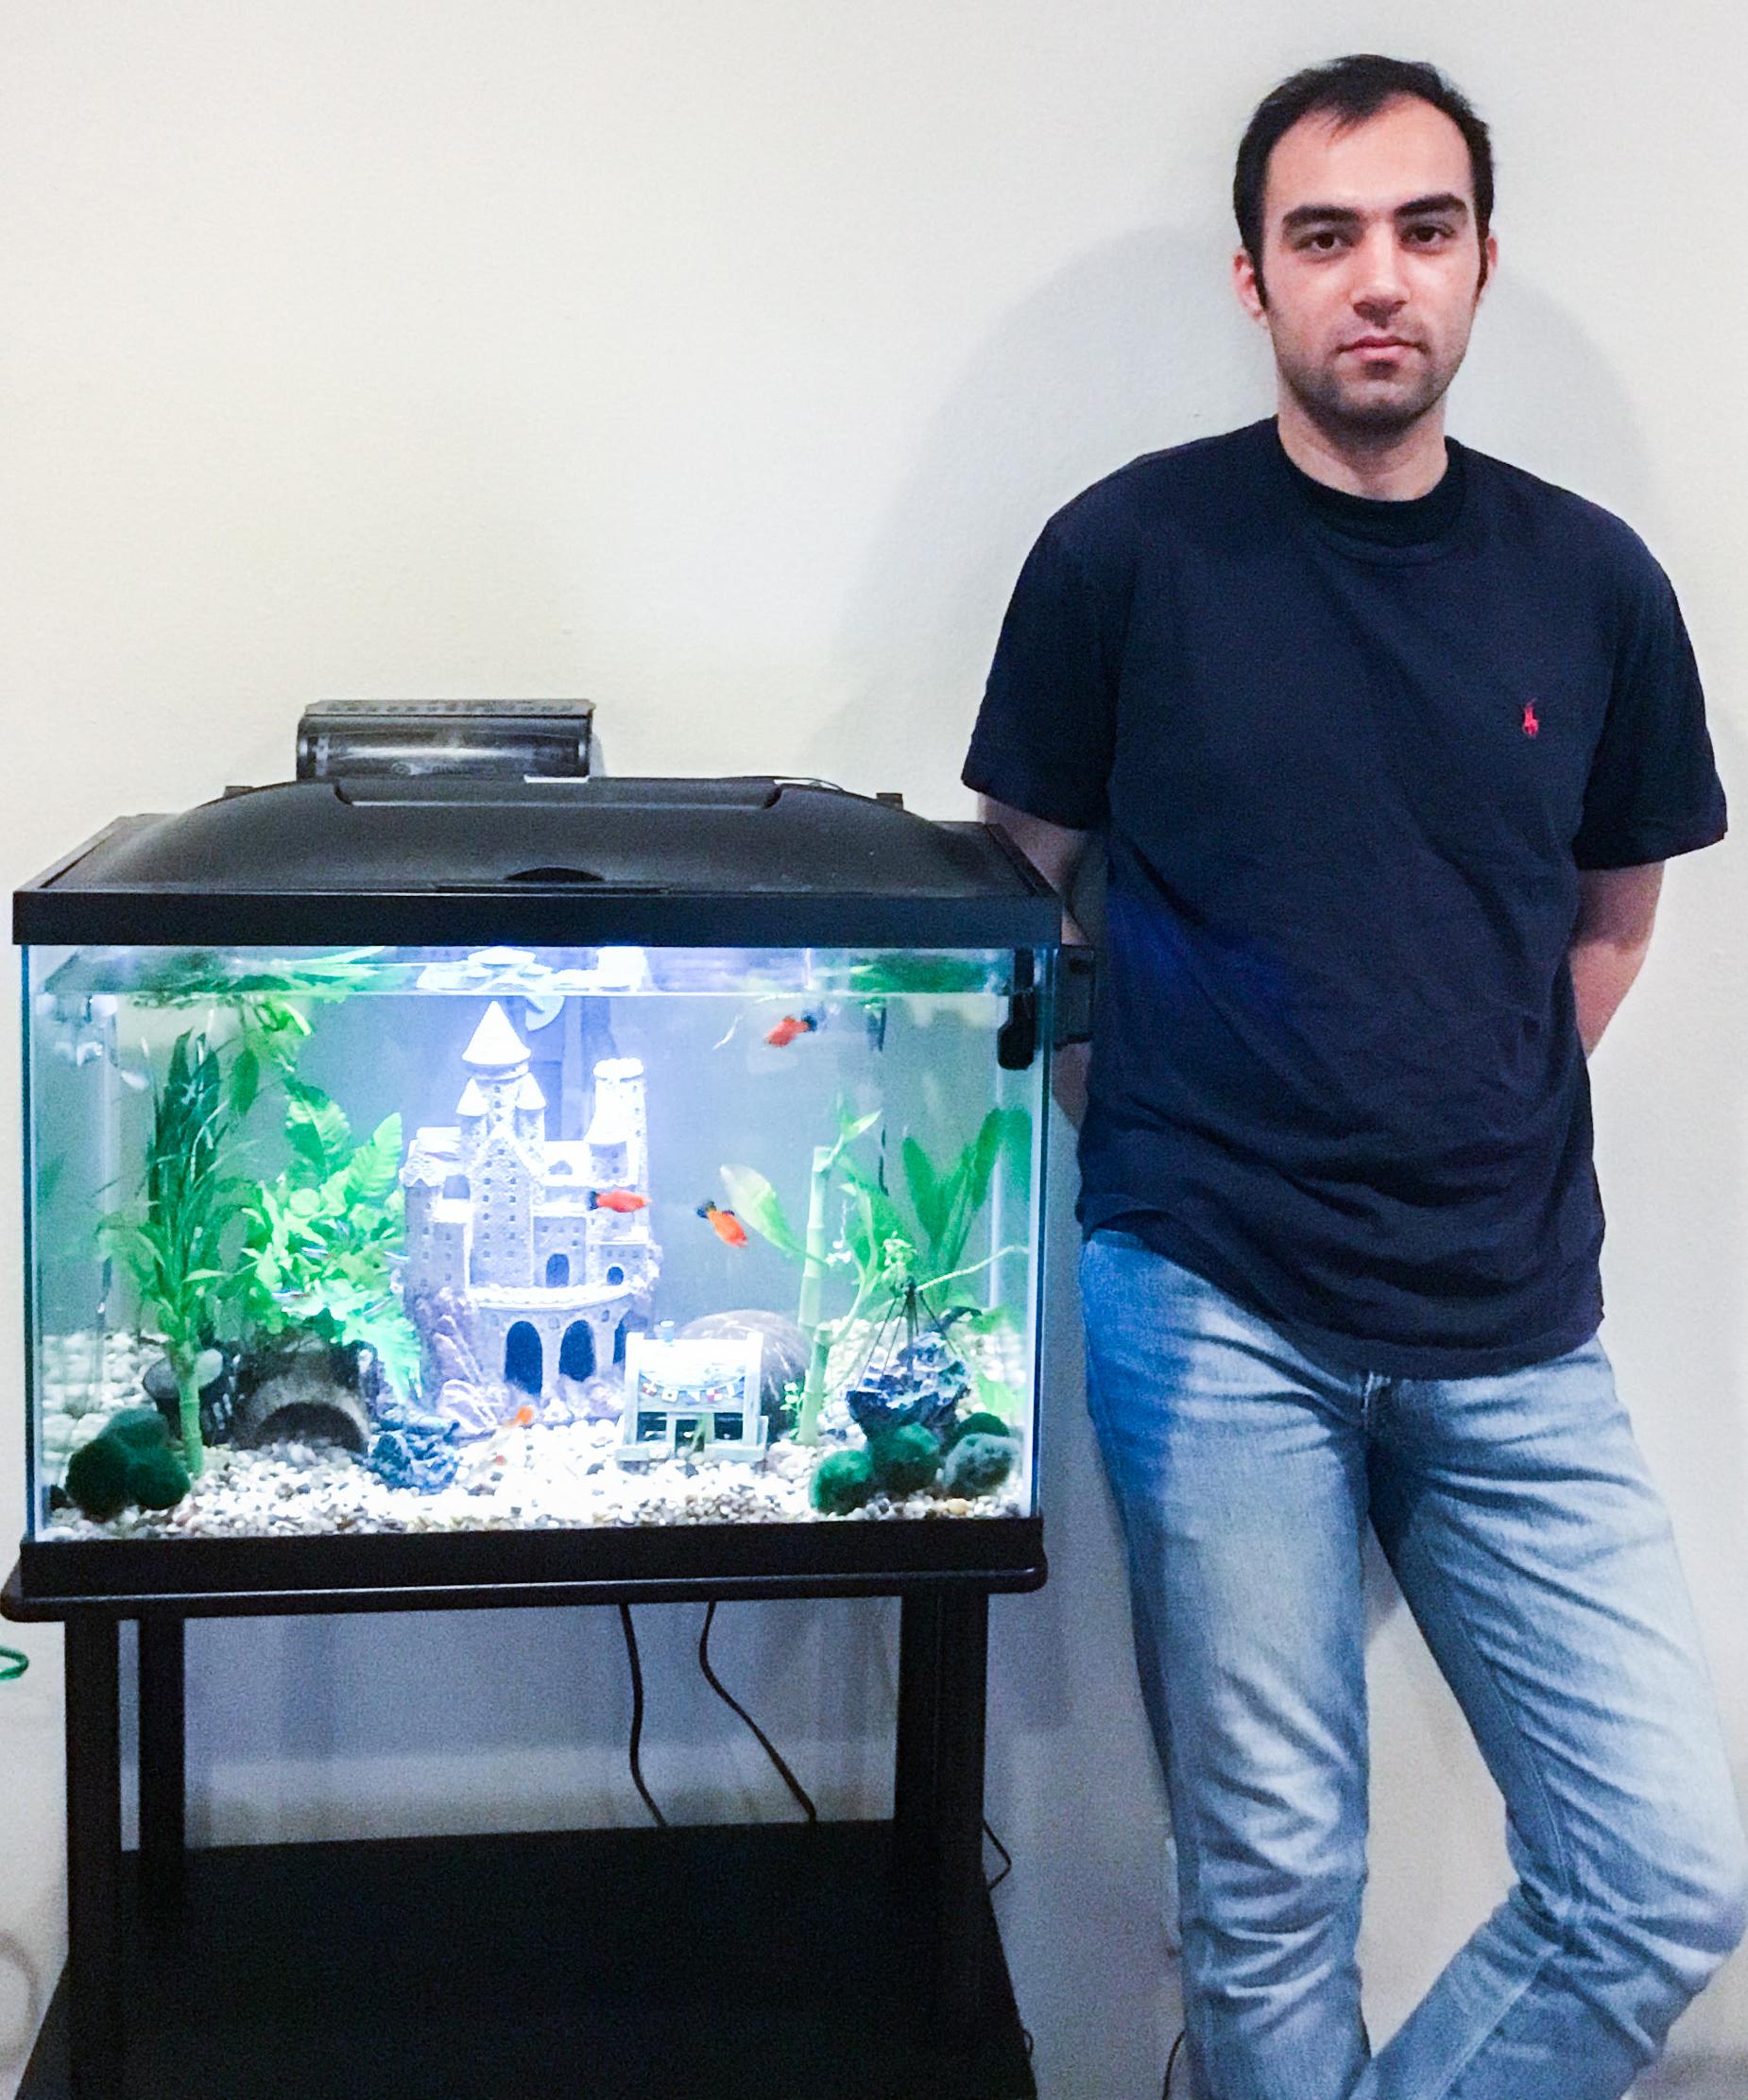 Saeed Seddighin wins fellowship